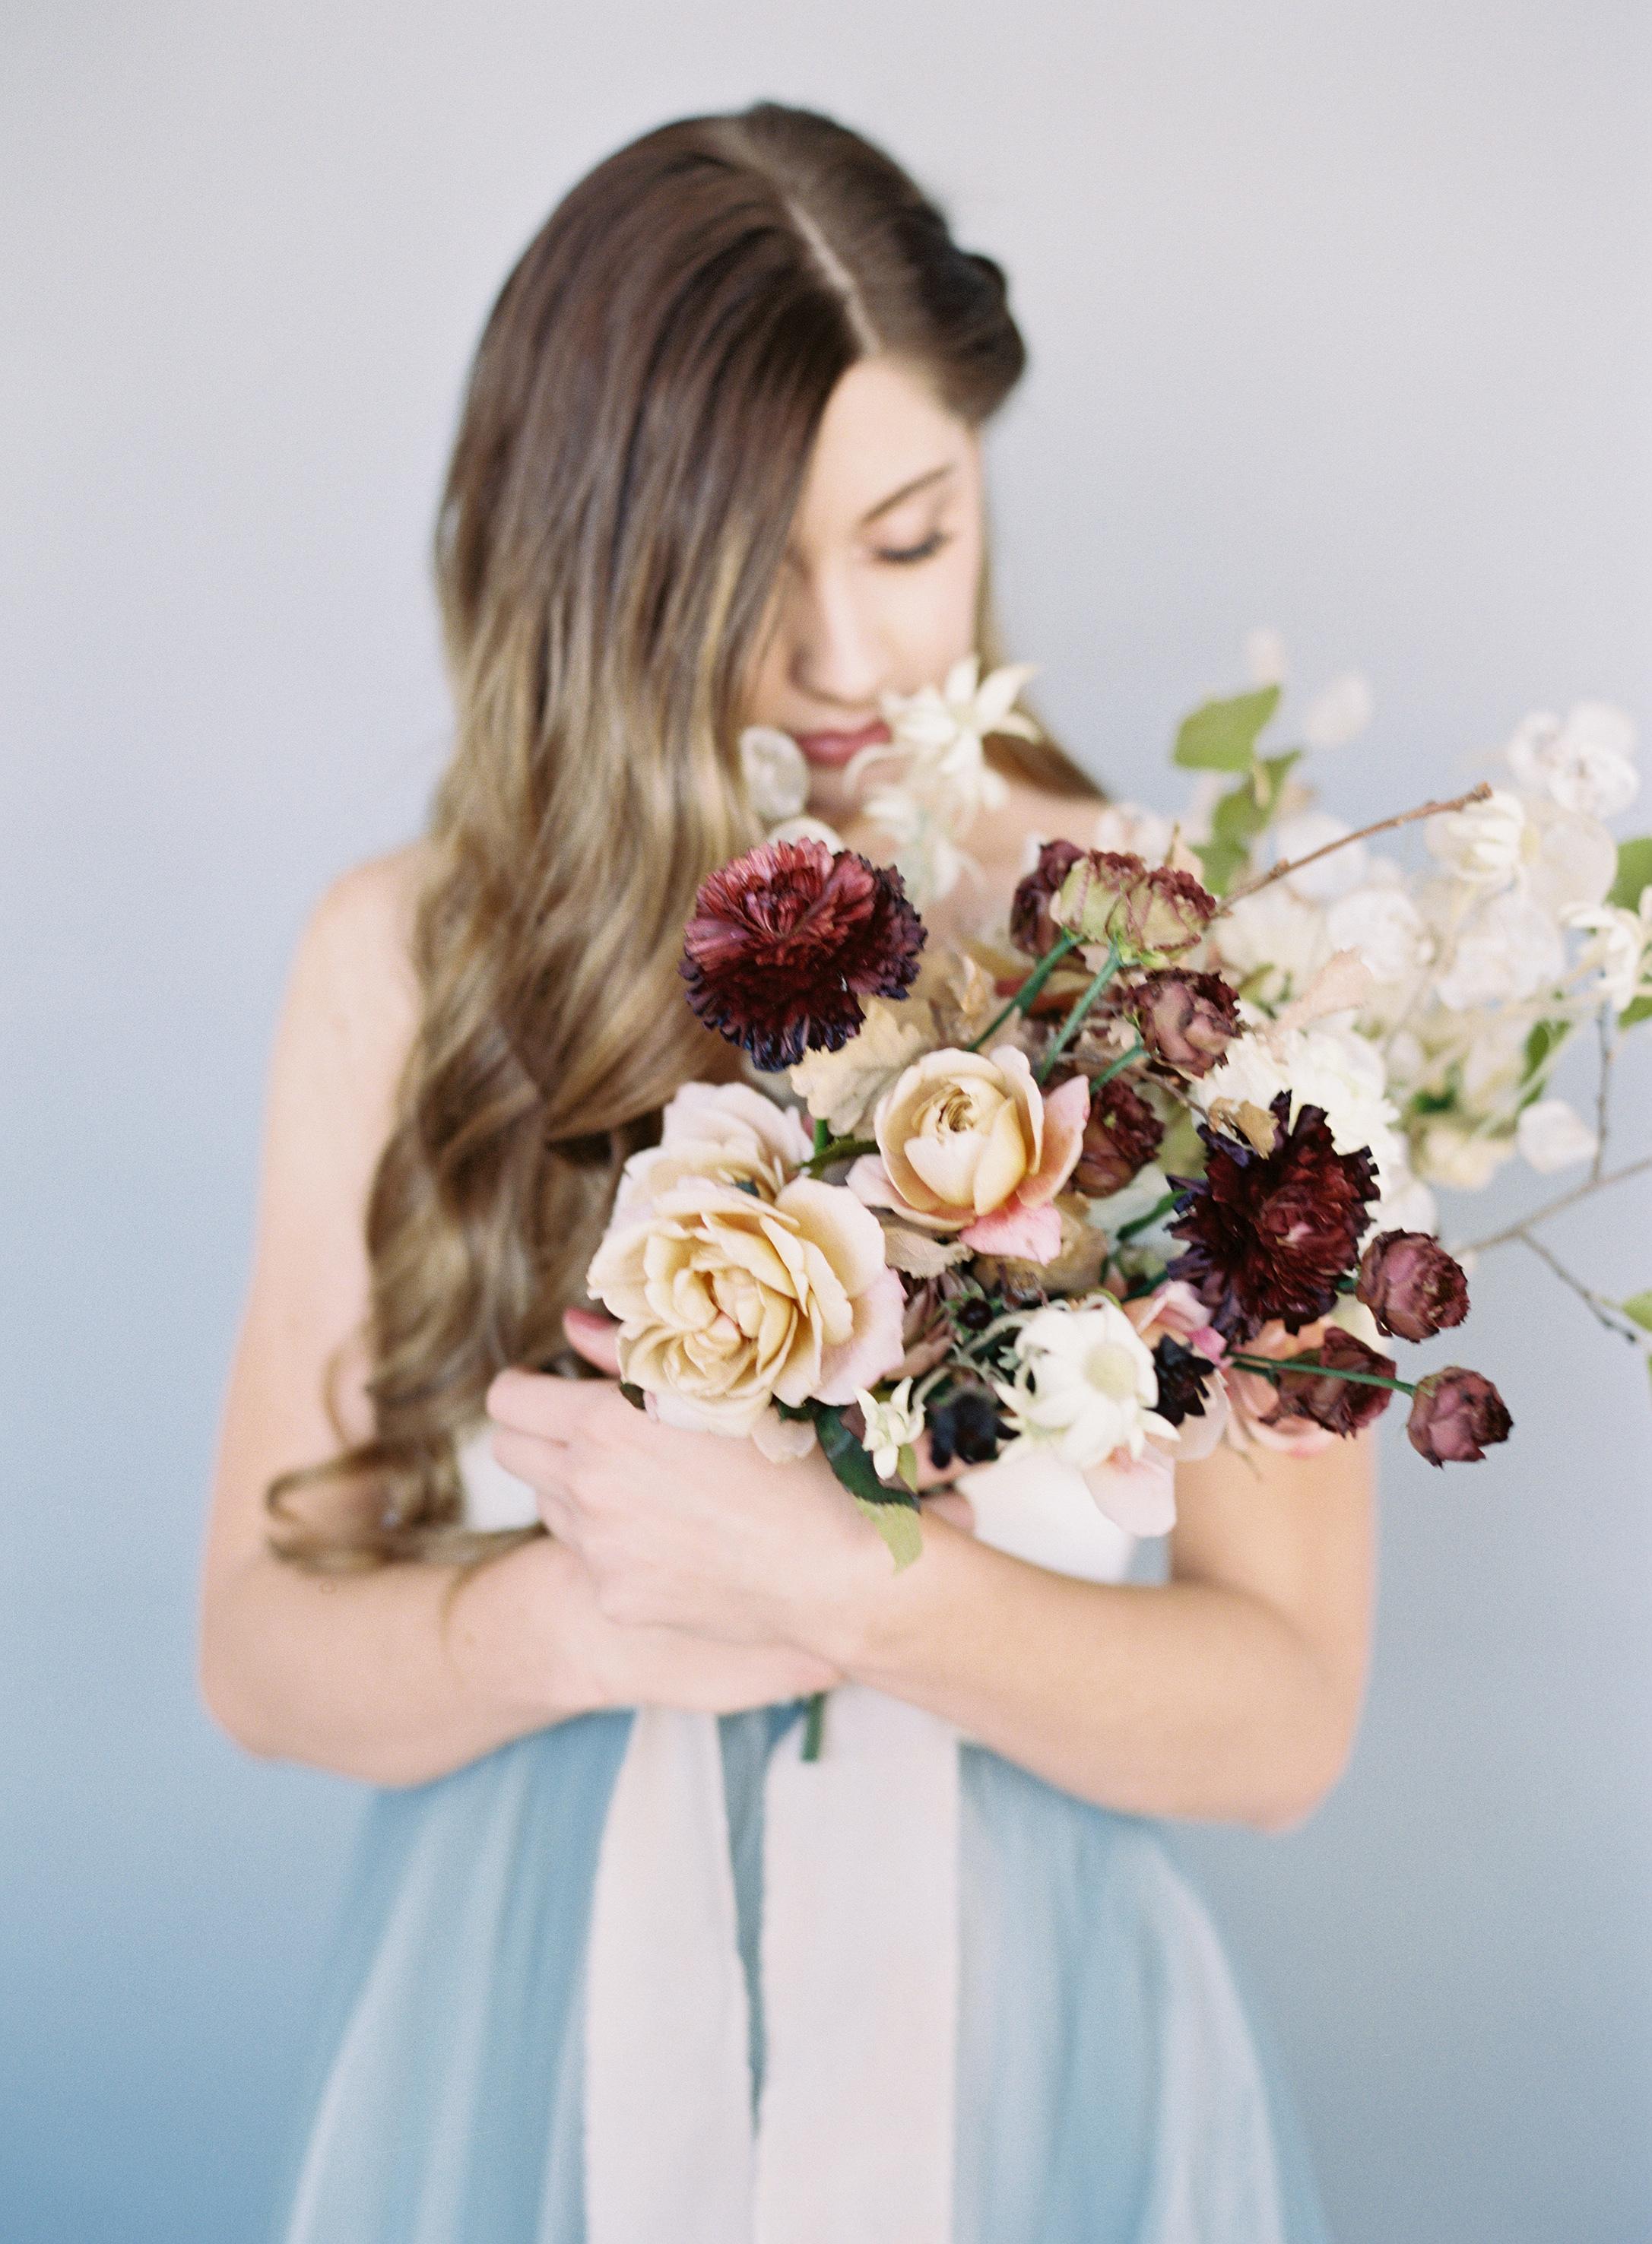 Sentient Floral Workshop-Carrie King Photographer-059.jpg